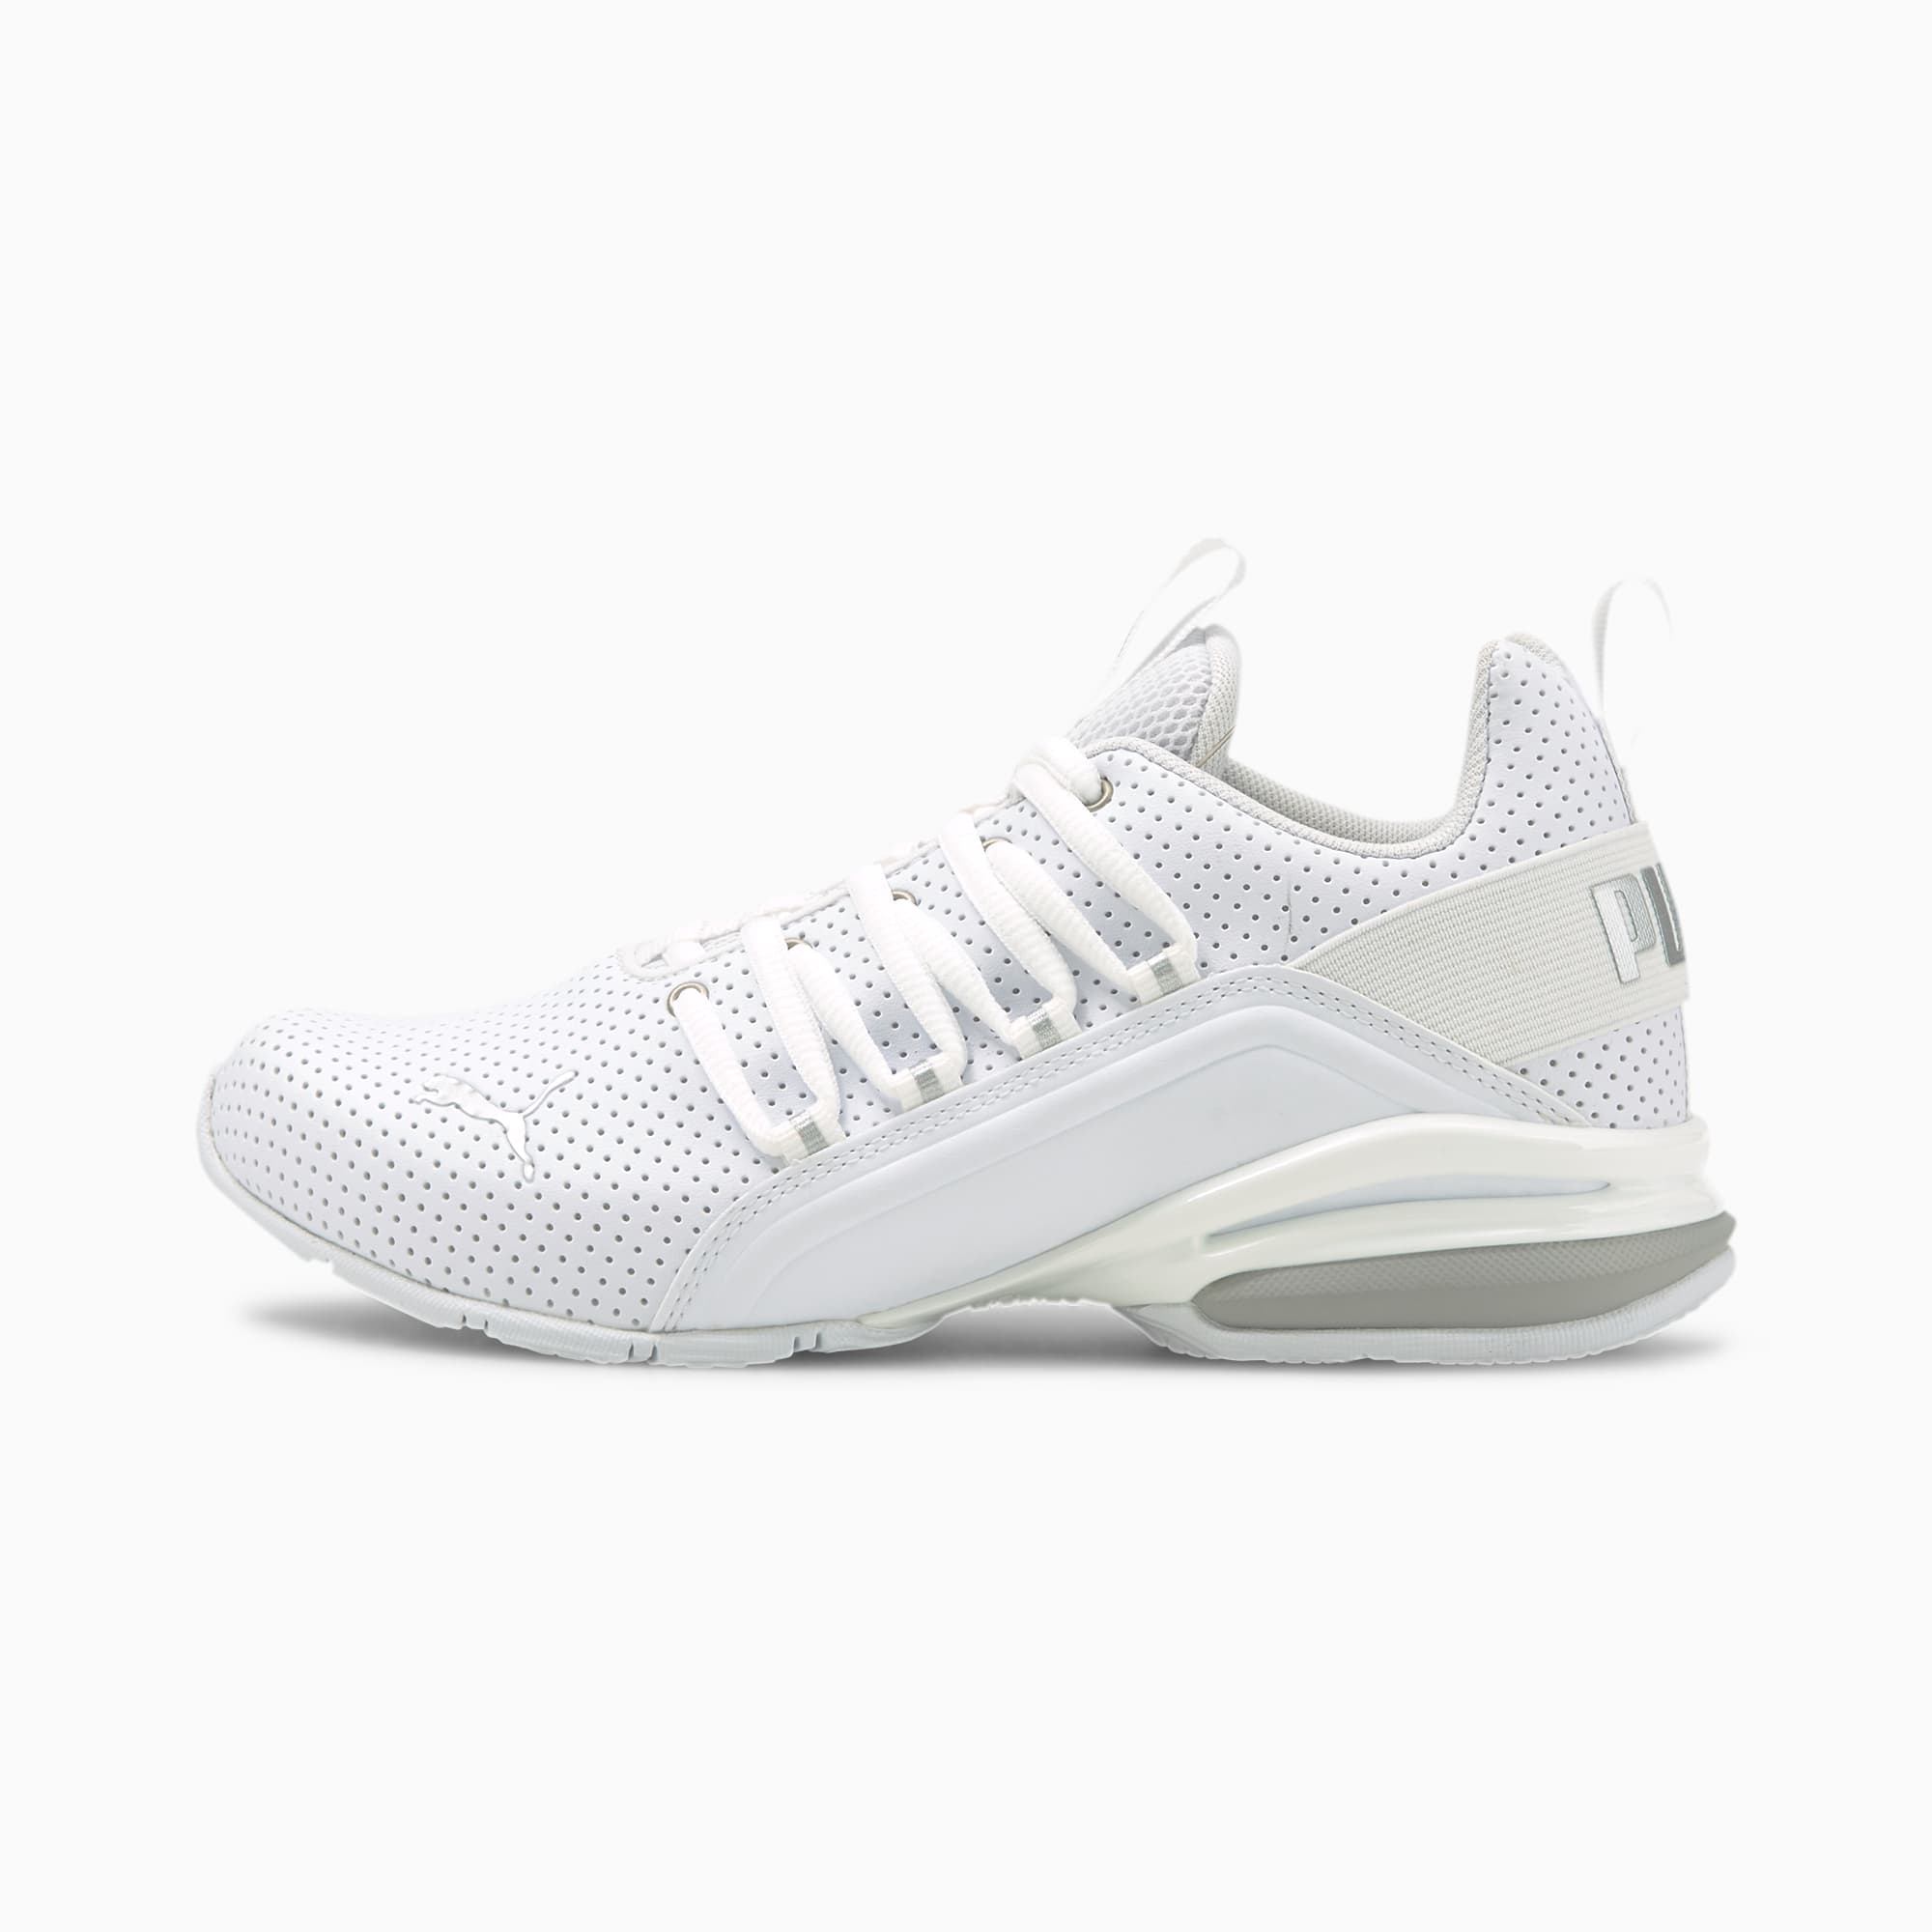 PUMA Axelion M Perf Metallic Training Shoes JR   45% off & Cash Back